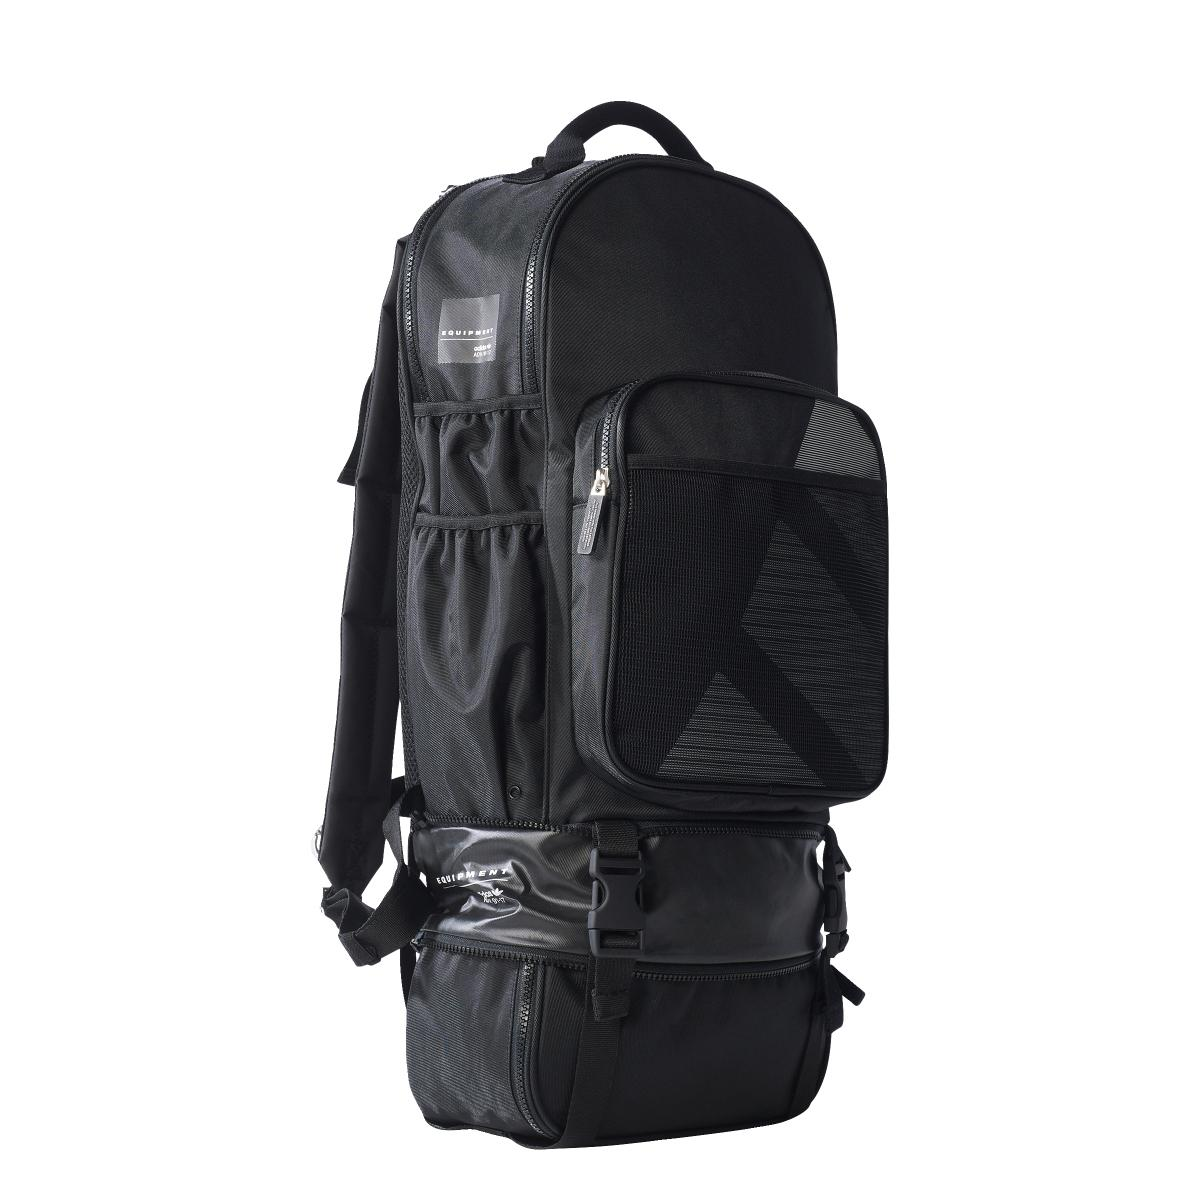 5b97892e84 Lyst - adidas Backpack Street Eqt in Black for Men